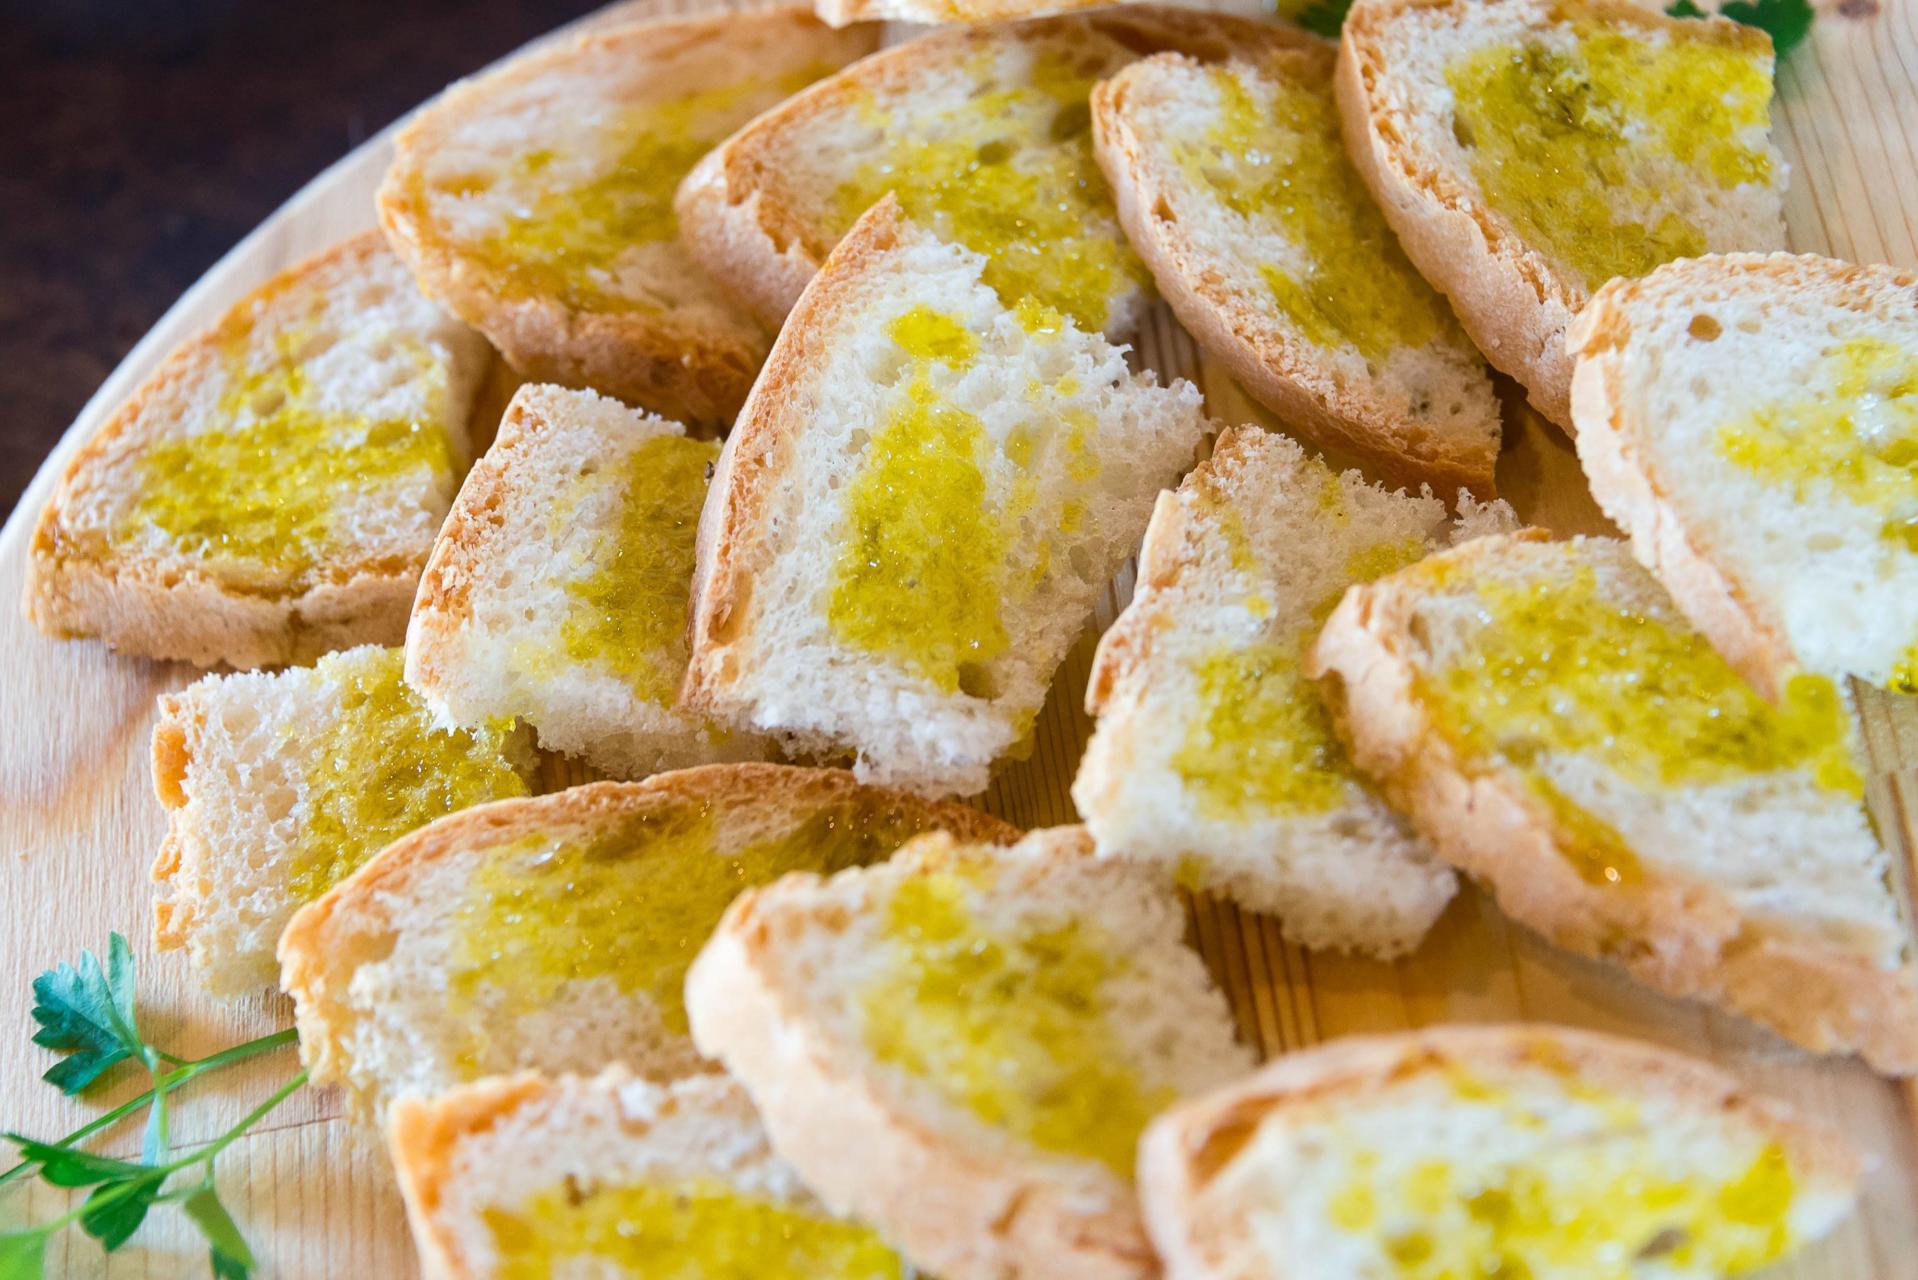 Olivenolje på brød - pane e olio - Foto: Luca Barelli